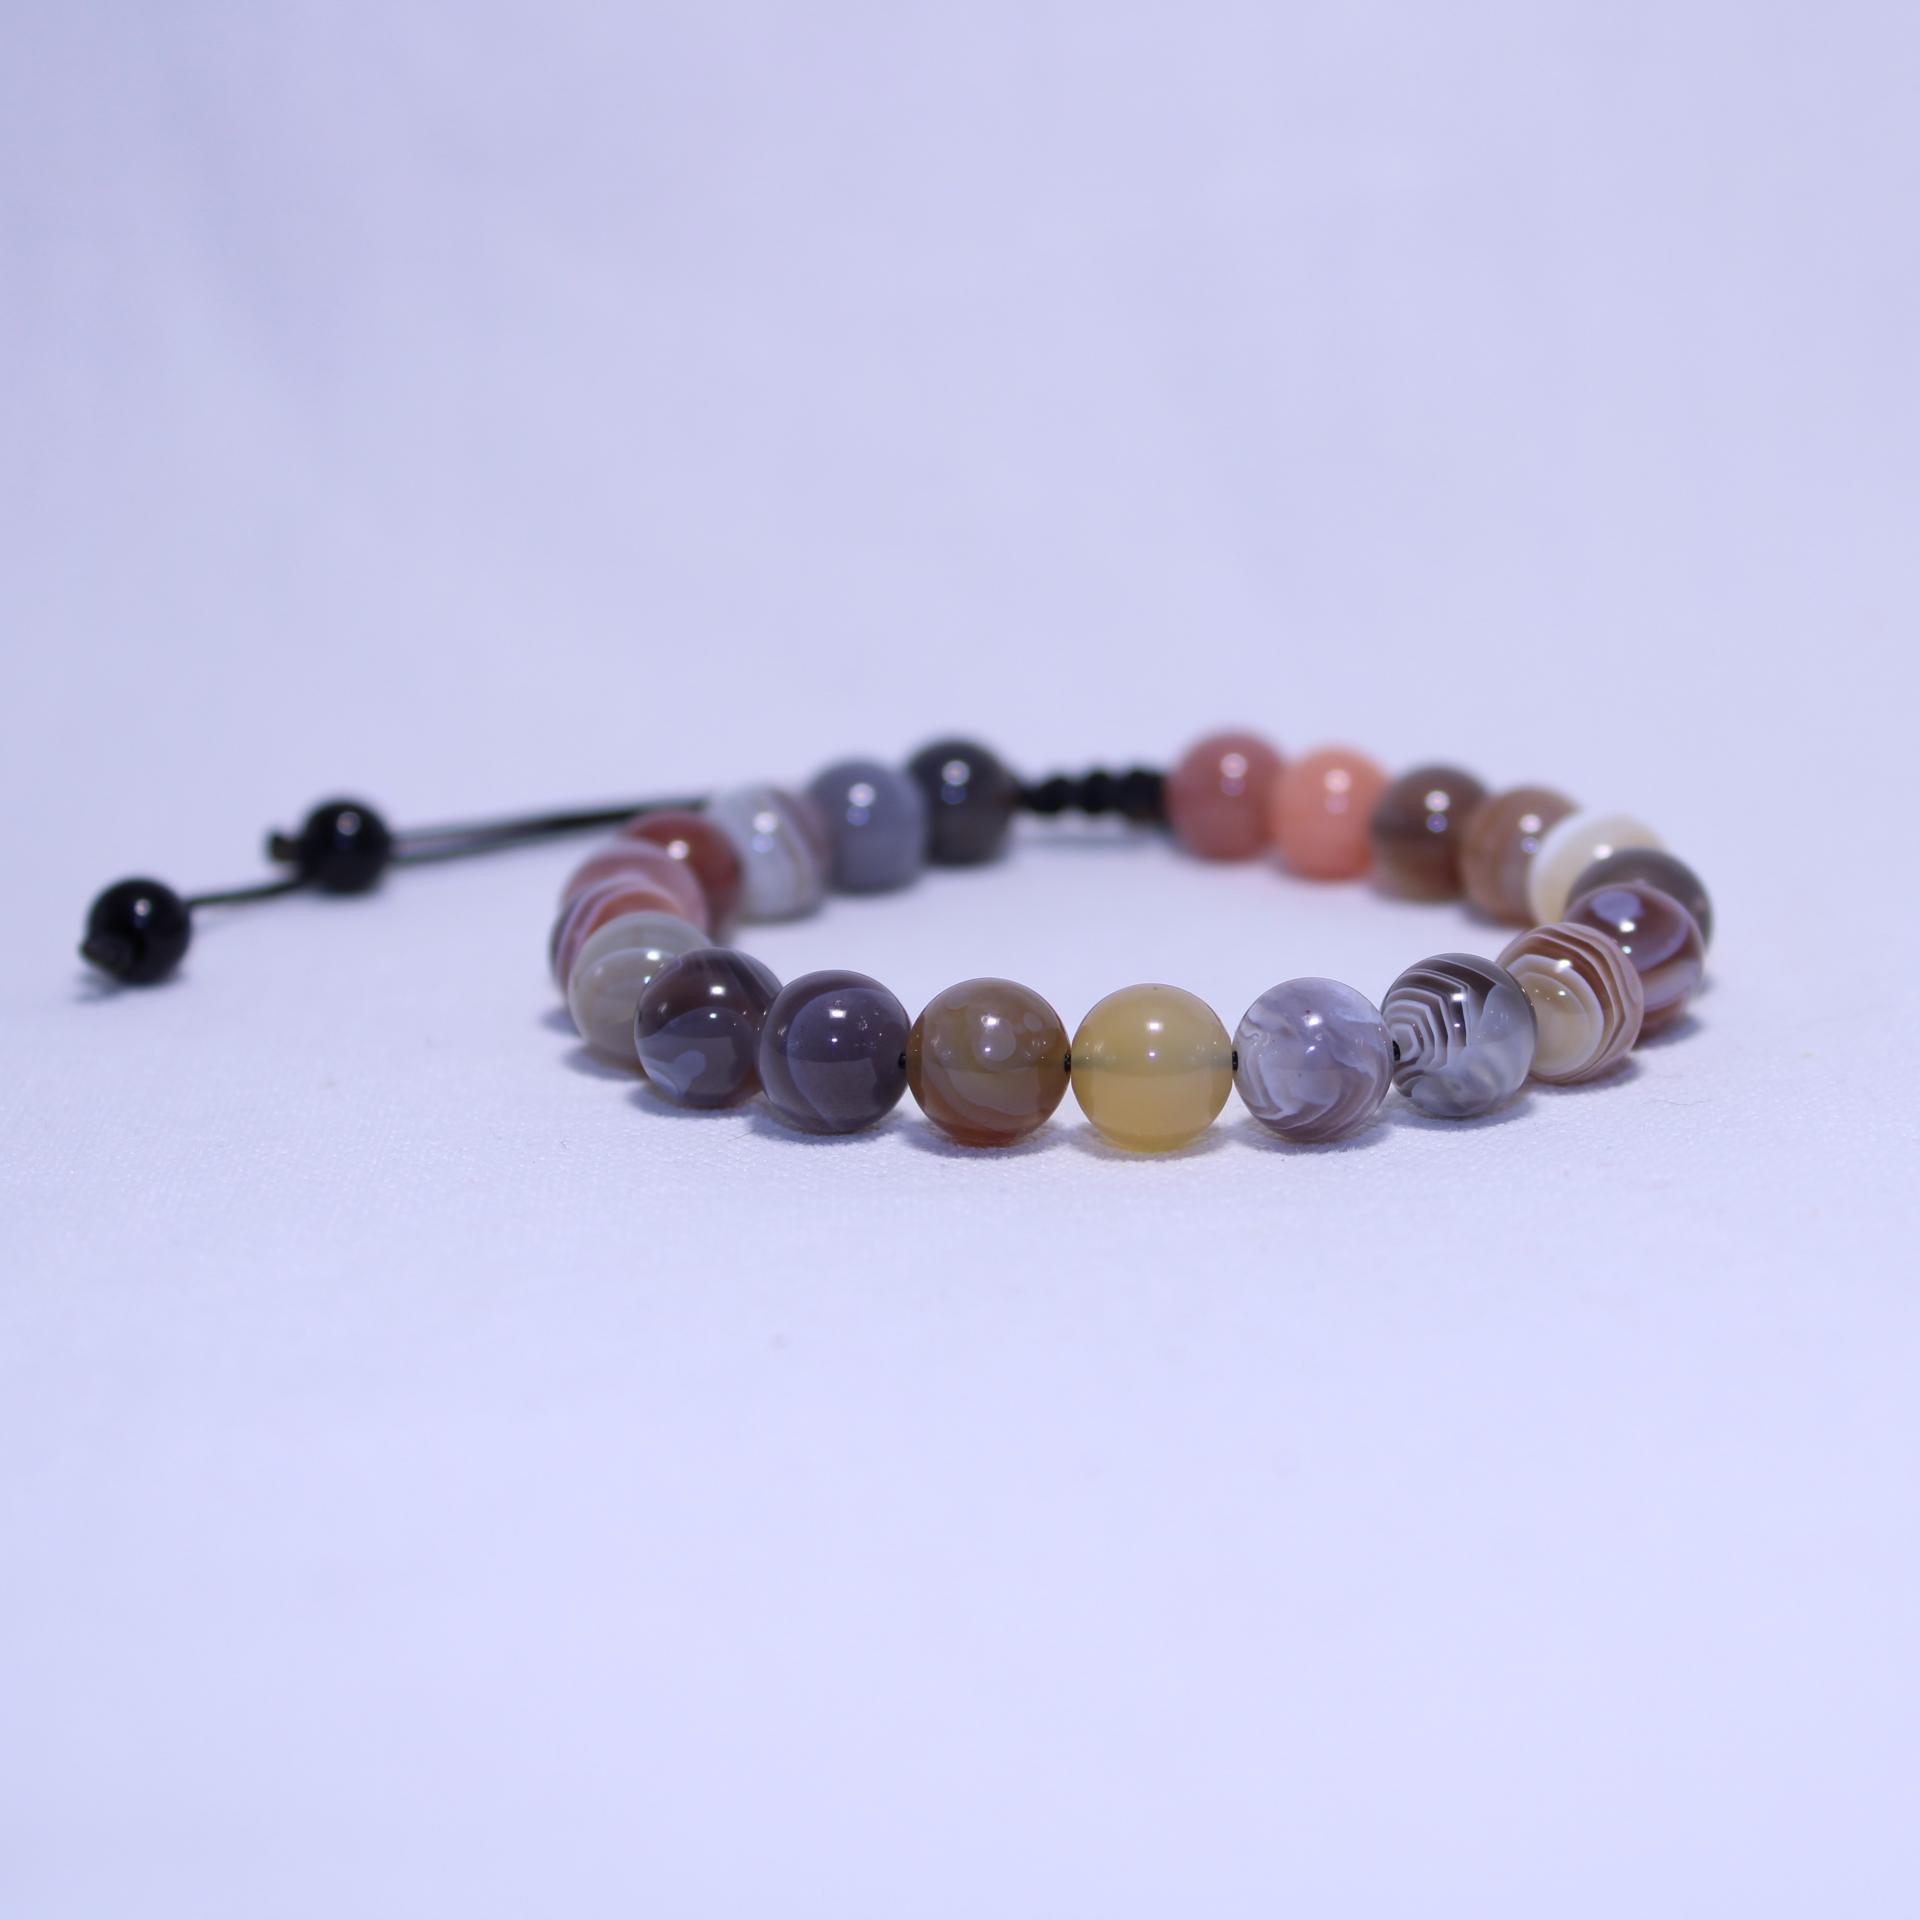 Bracelet agate i24 4